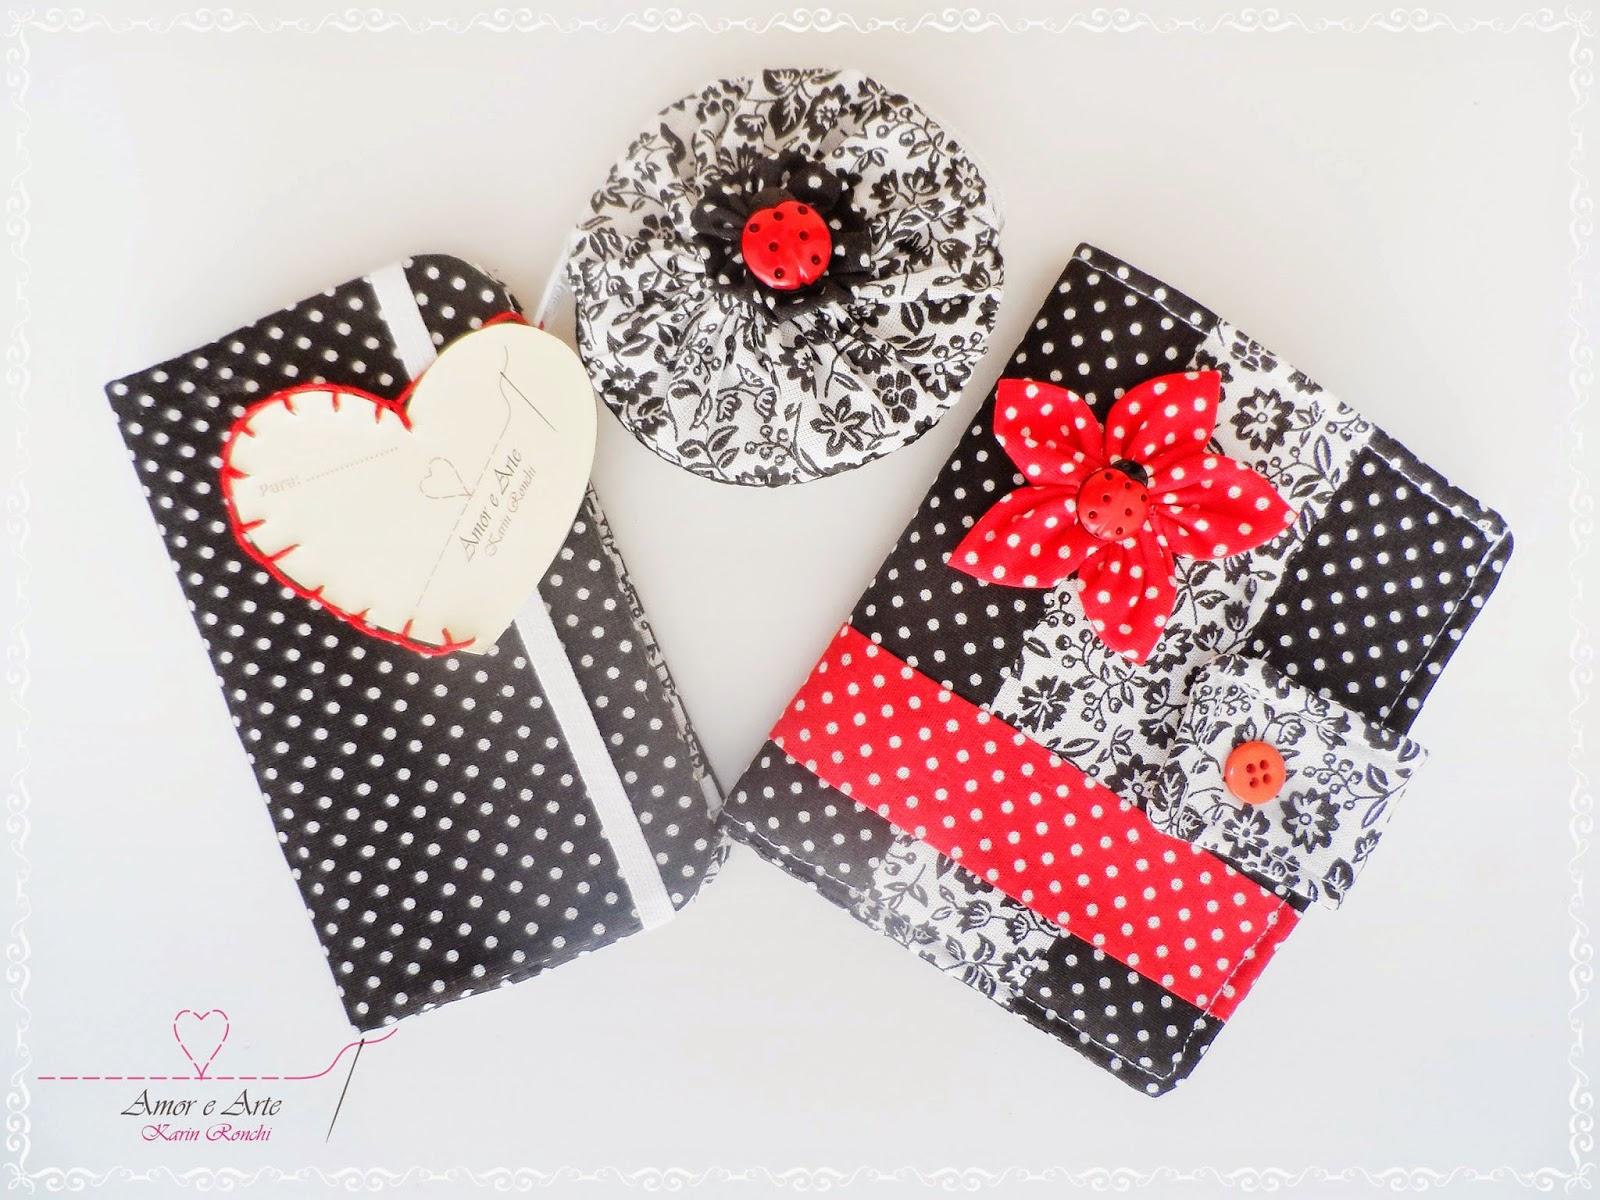 Kit: Carteira + Case para celular + Niqueleira